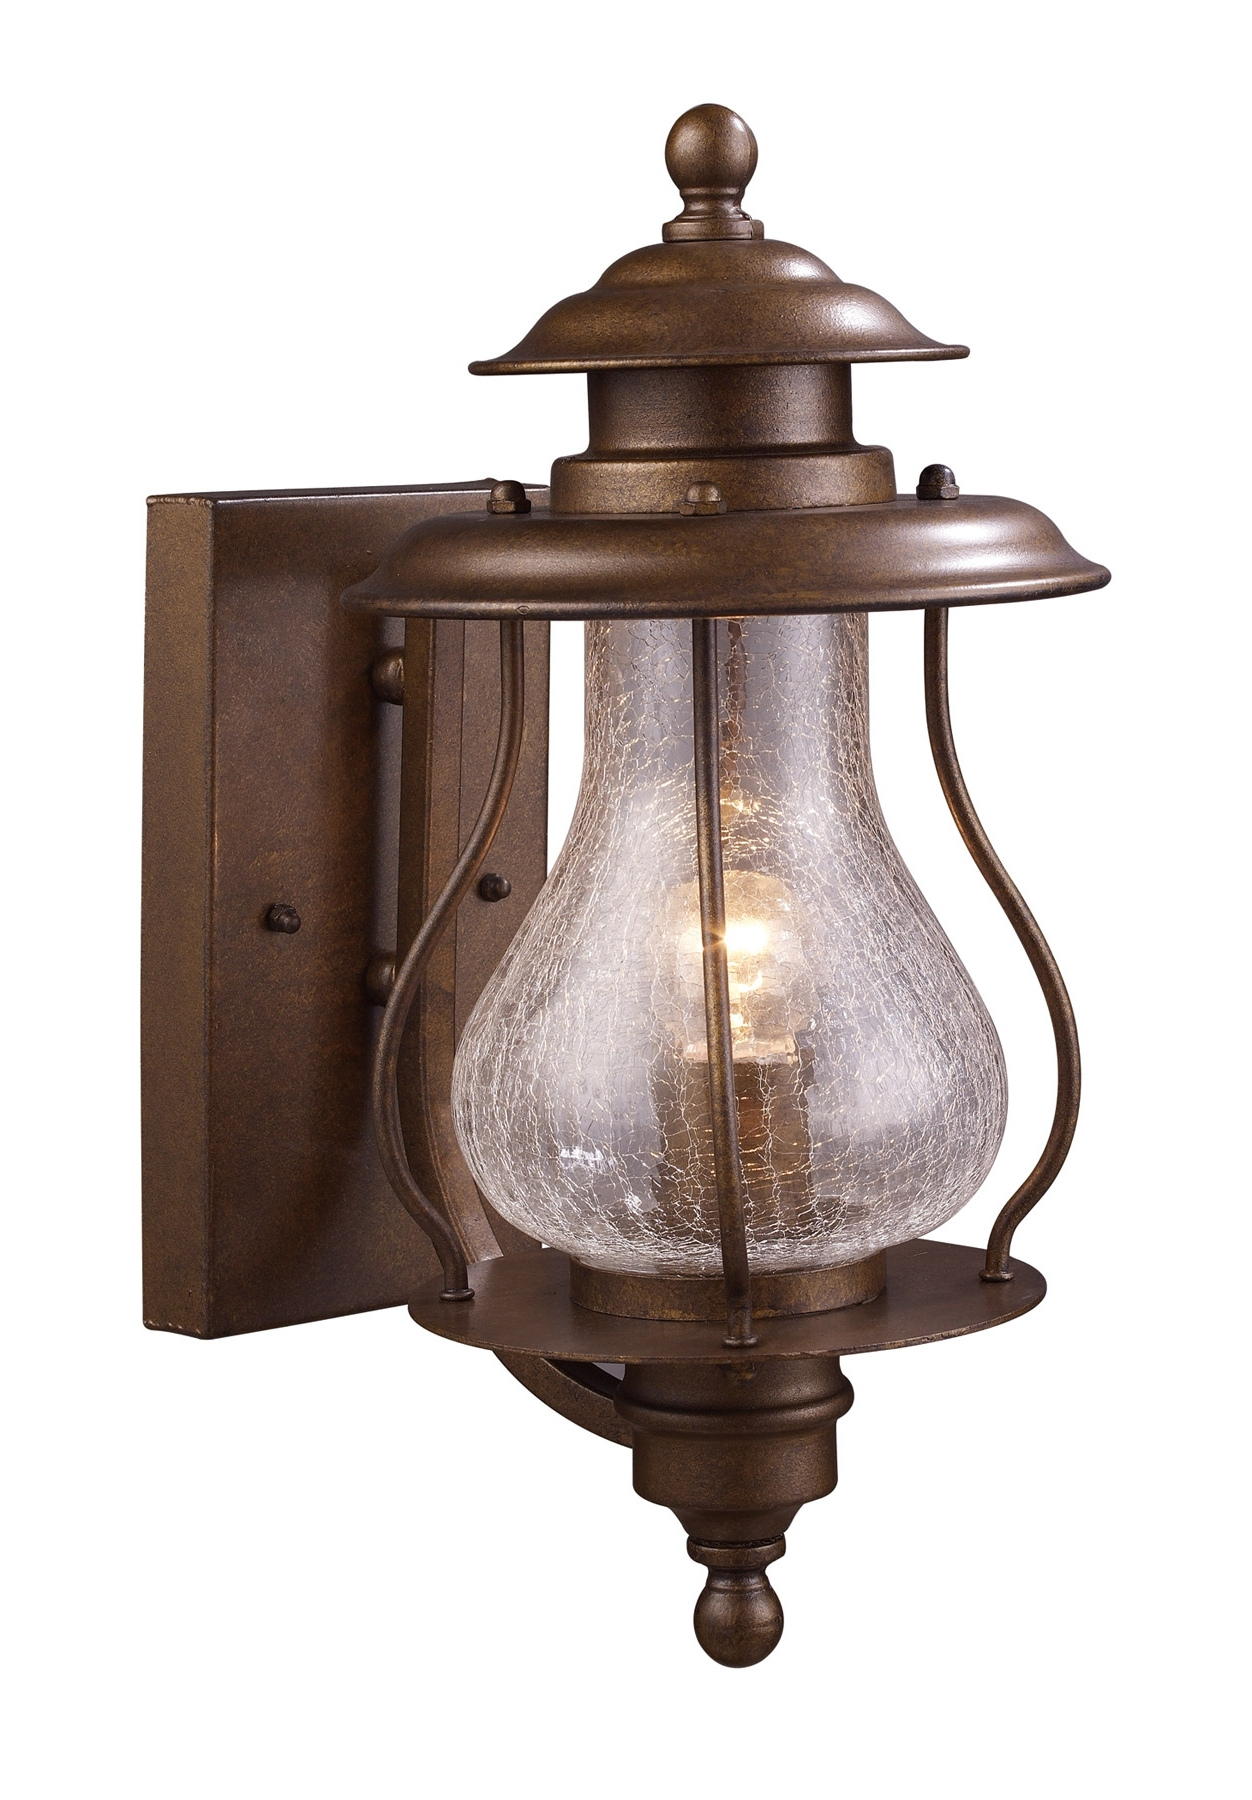 Elk Lighting 62005 1 Wikshire Outdoor Wall Mount Lantern Regarding Popular Outdoor Lanterns Lights (Gallery 6 of 20)